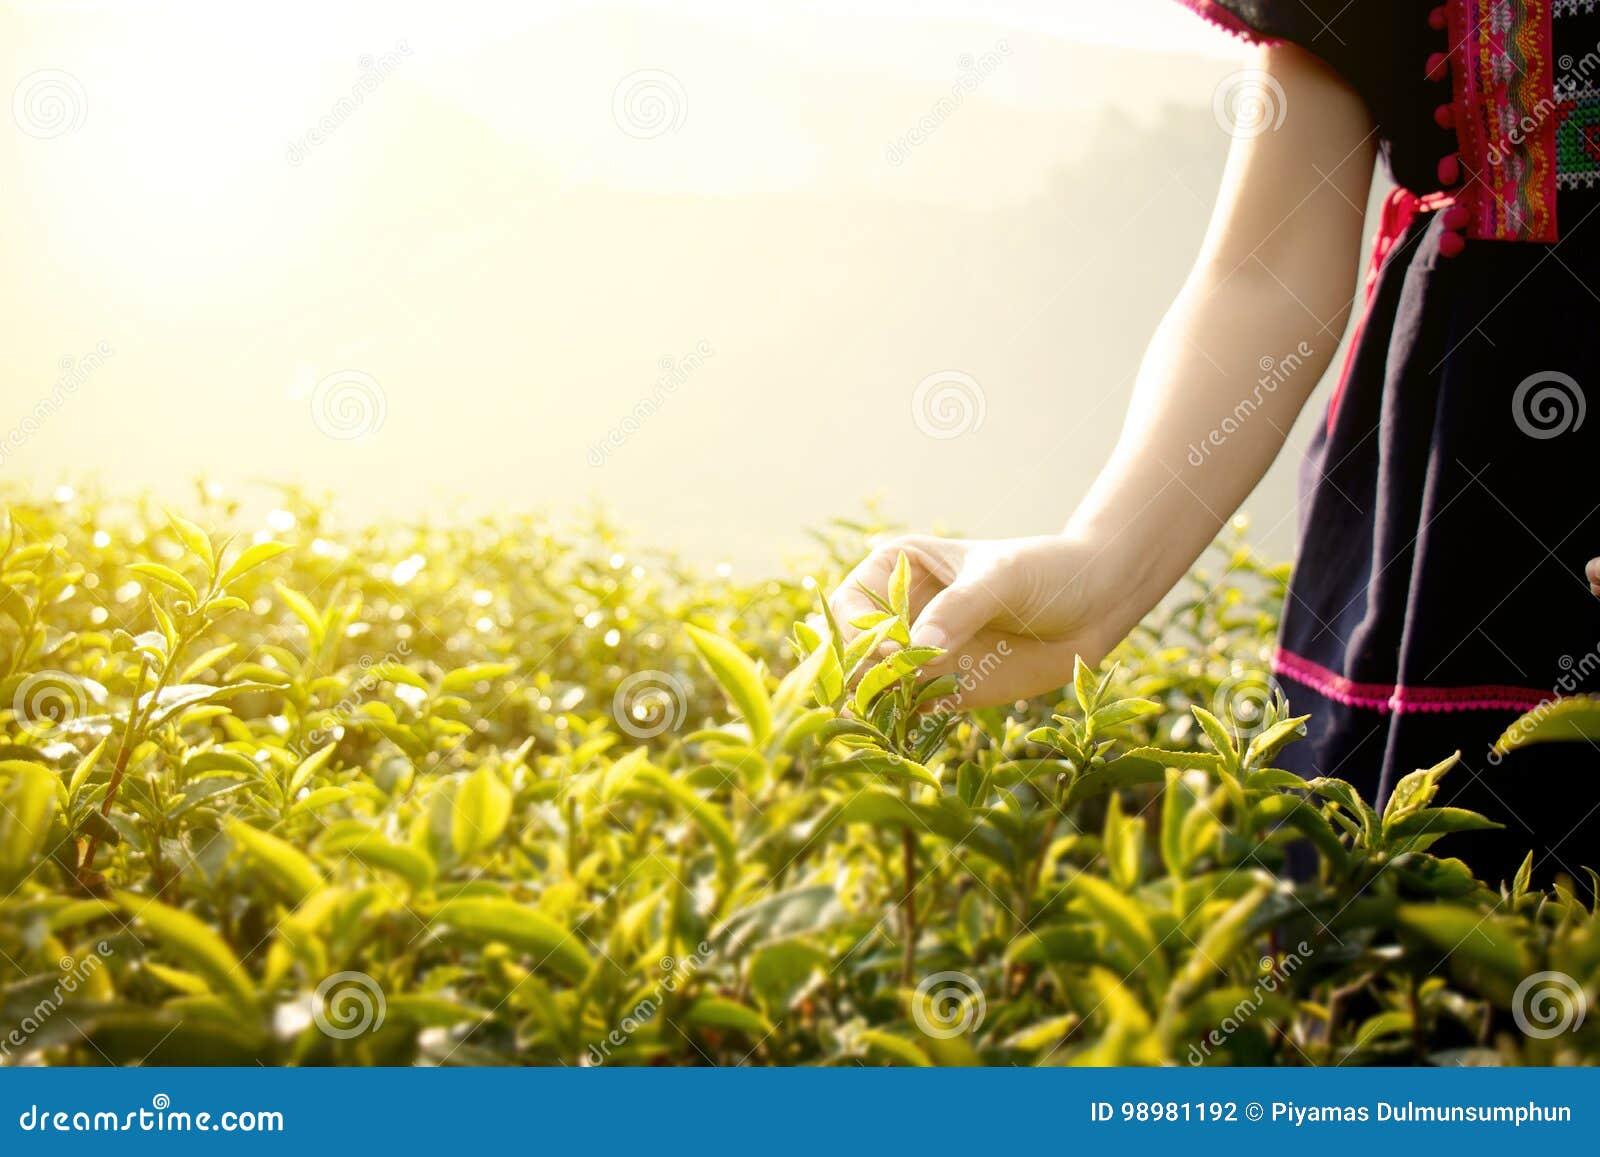 Little hill tribe farmer from Thailand picking tea leaves on tea